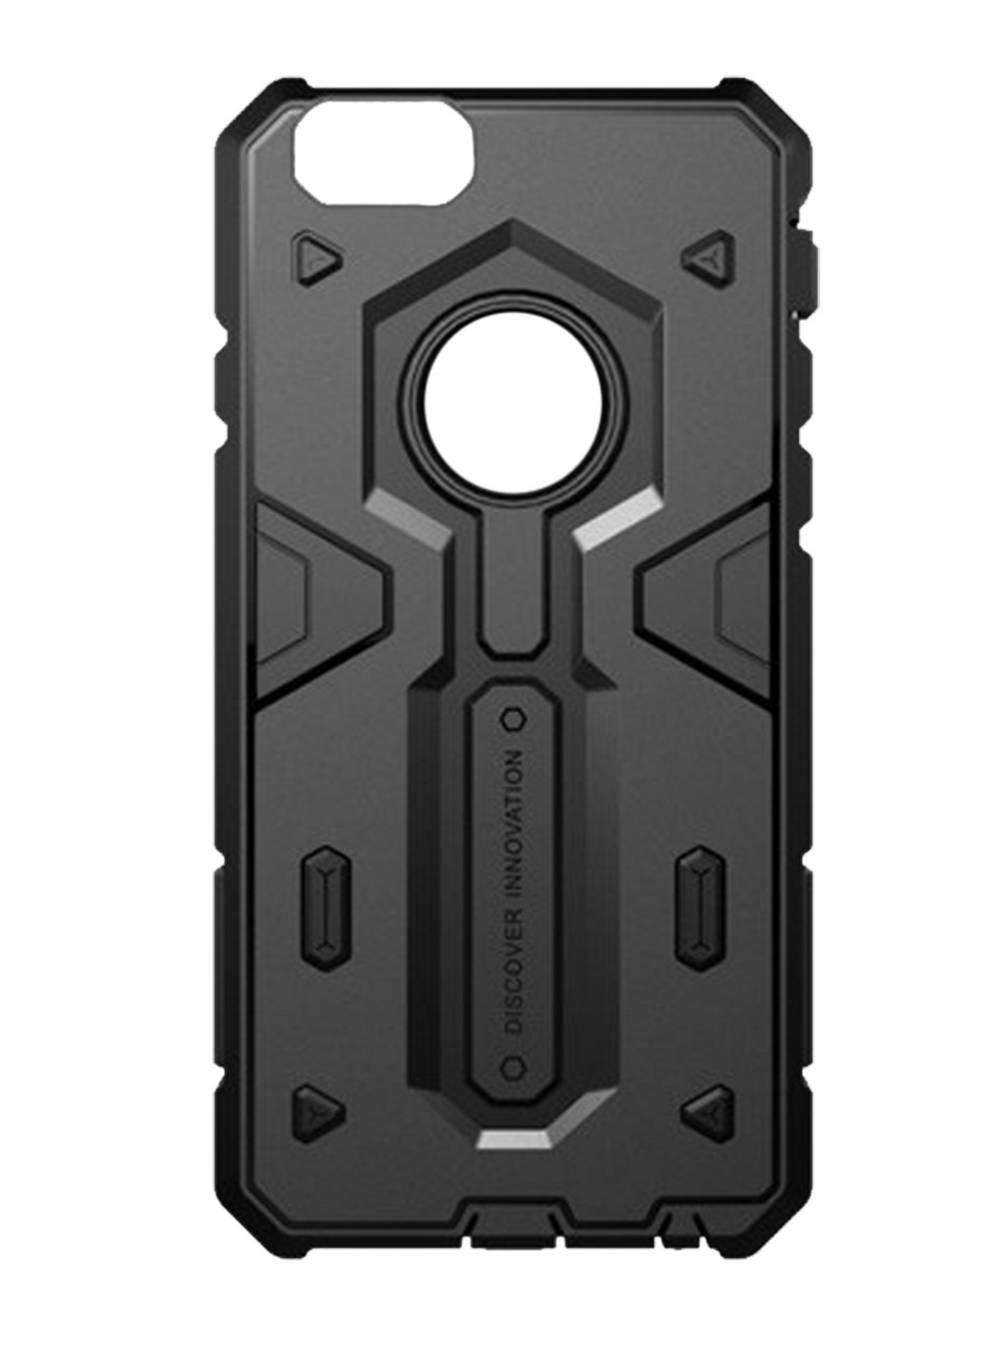 Nillkin Pouzdro Black pro iPhone 6 4.7''